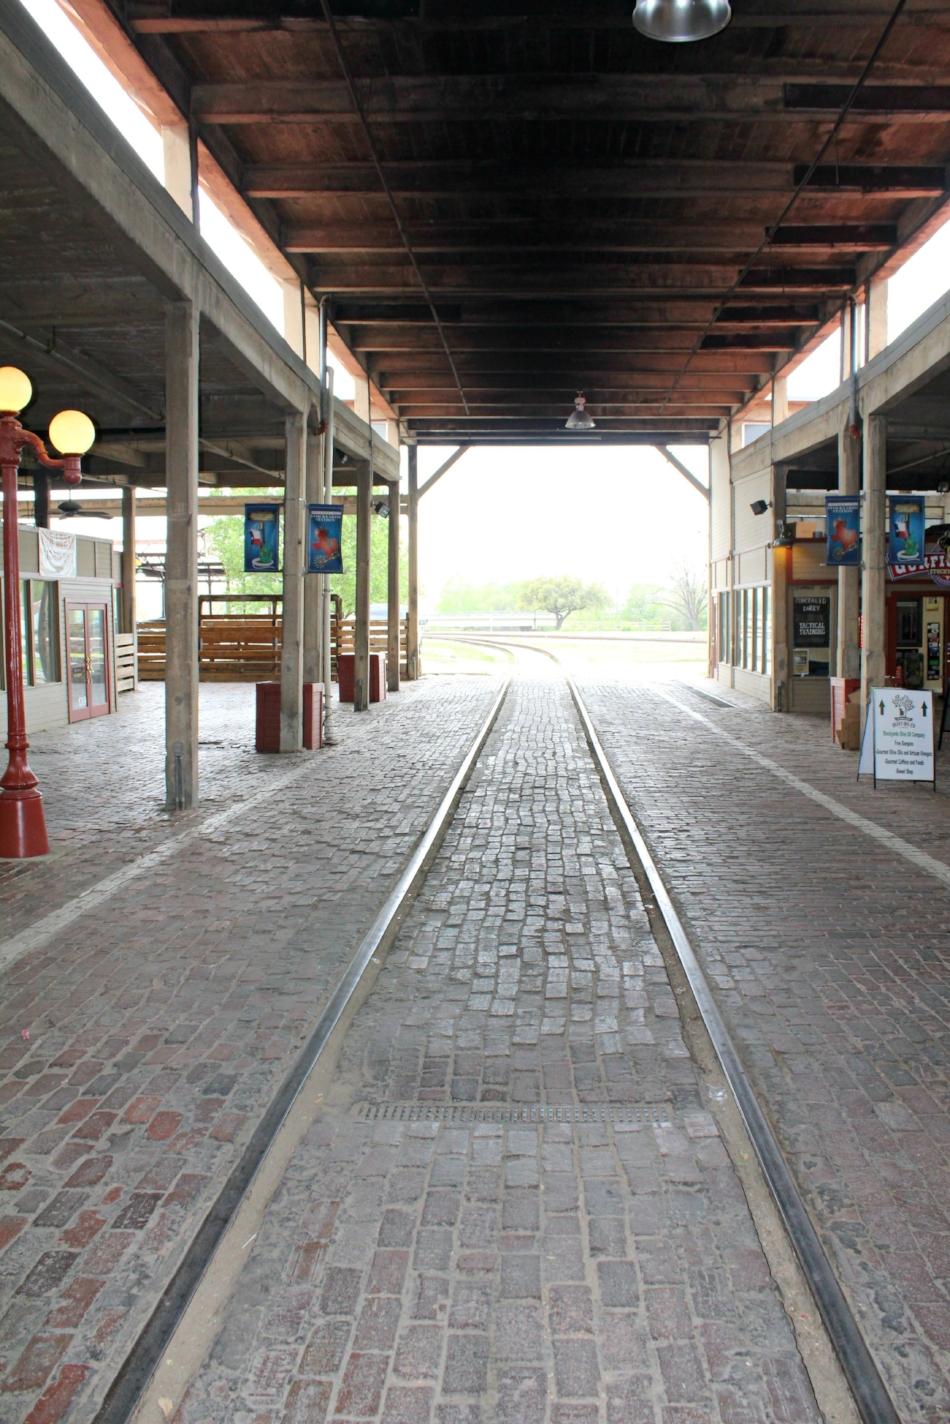 Fort Worth Stockyards 5.0.jpg